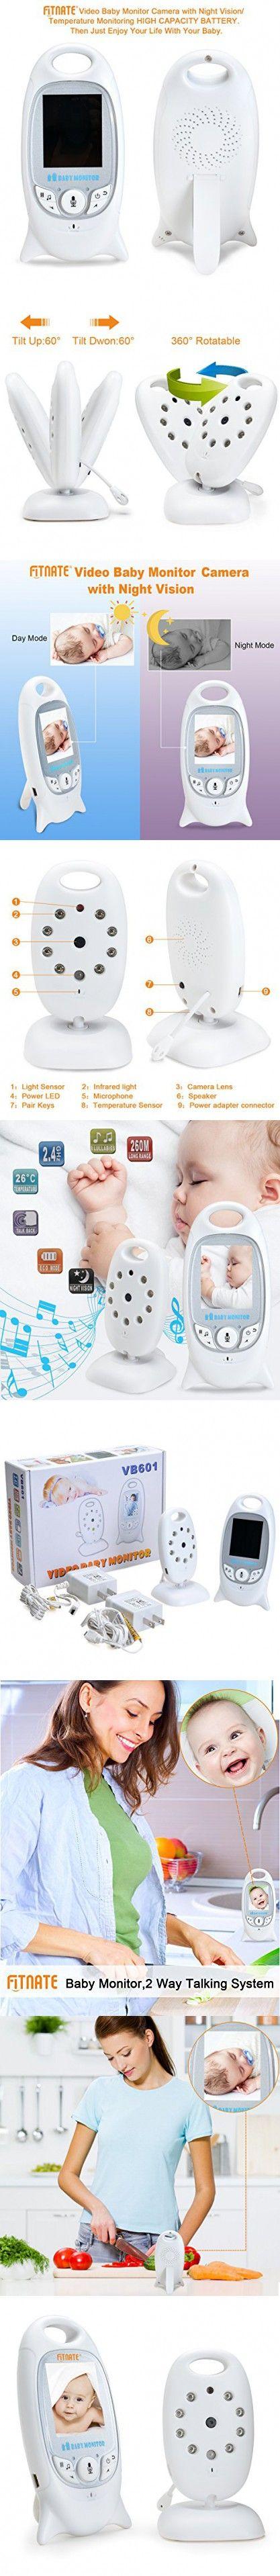 17 best ideas about baby monitor on pinterest babocush uk babocush amazon. Black Bedroom Furniture Sets. Home Design Ideas